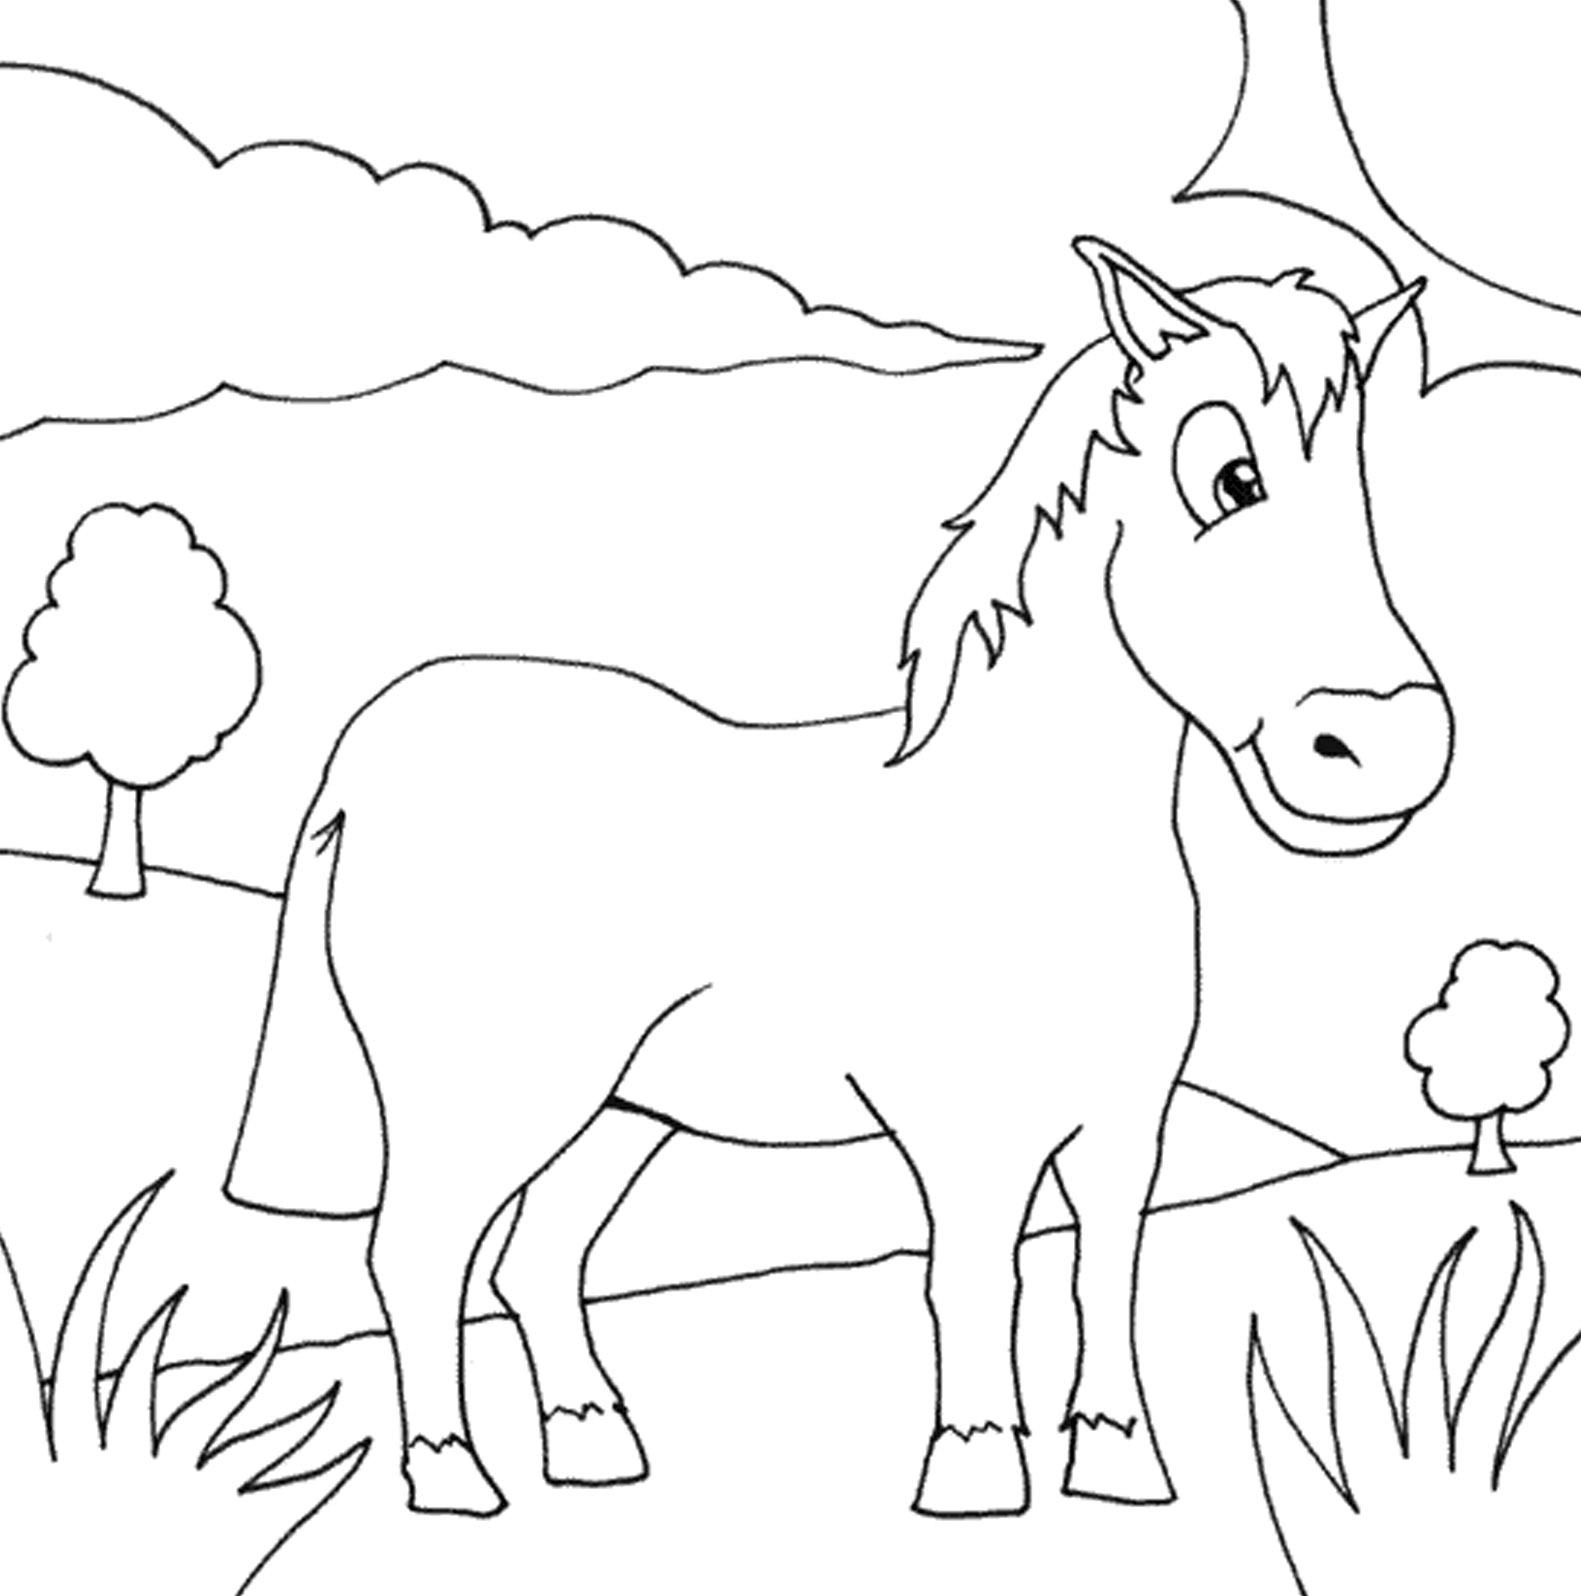 gambar kuda kartun - gambar kuda - gambar kuda kartun